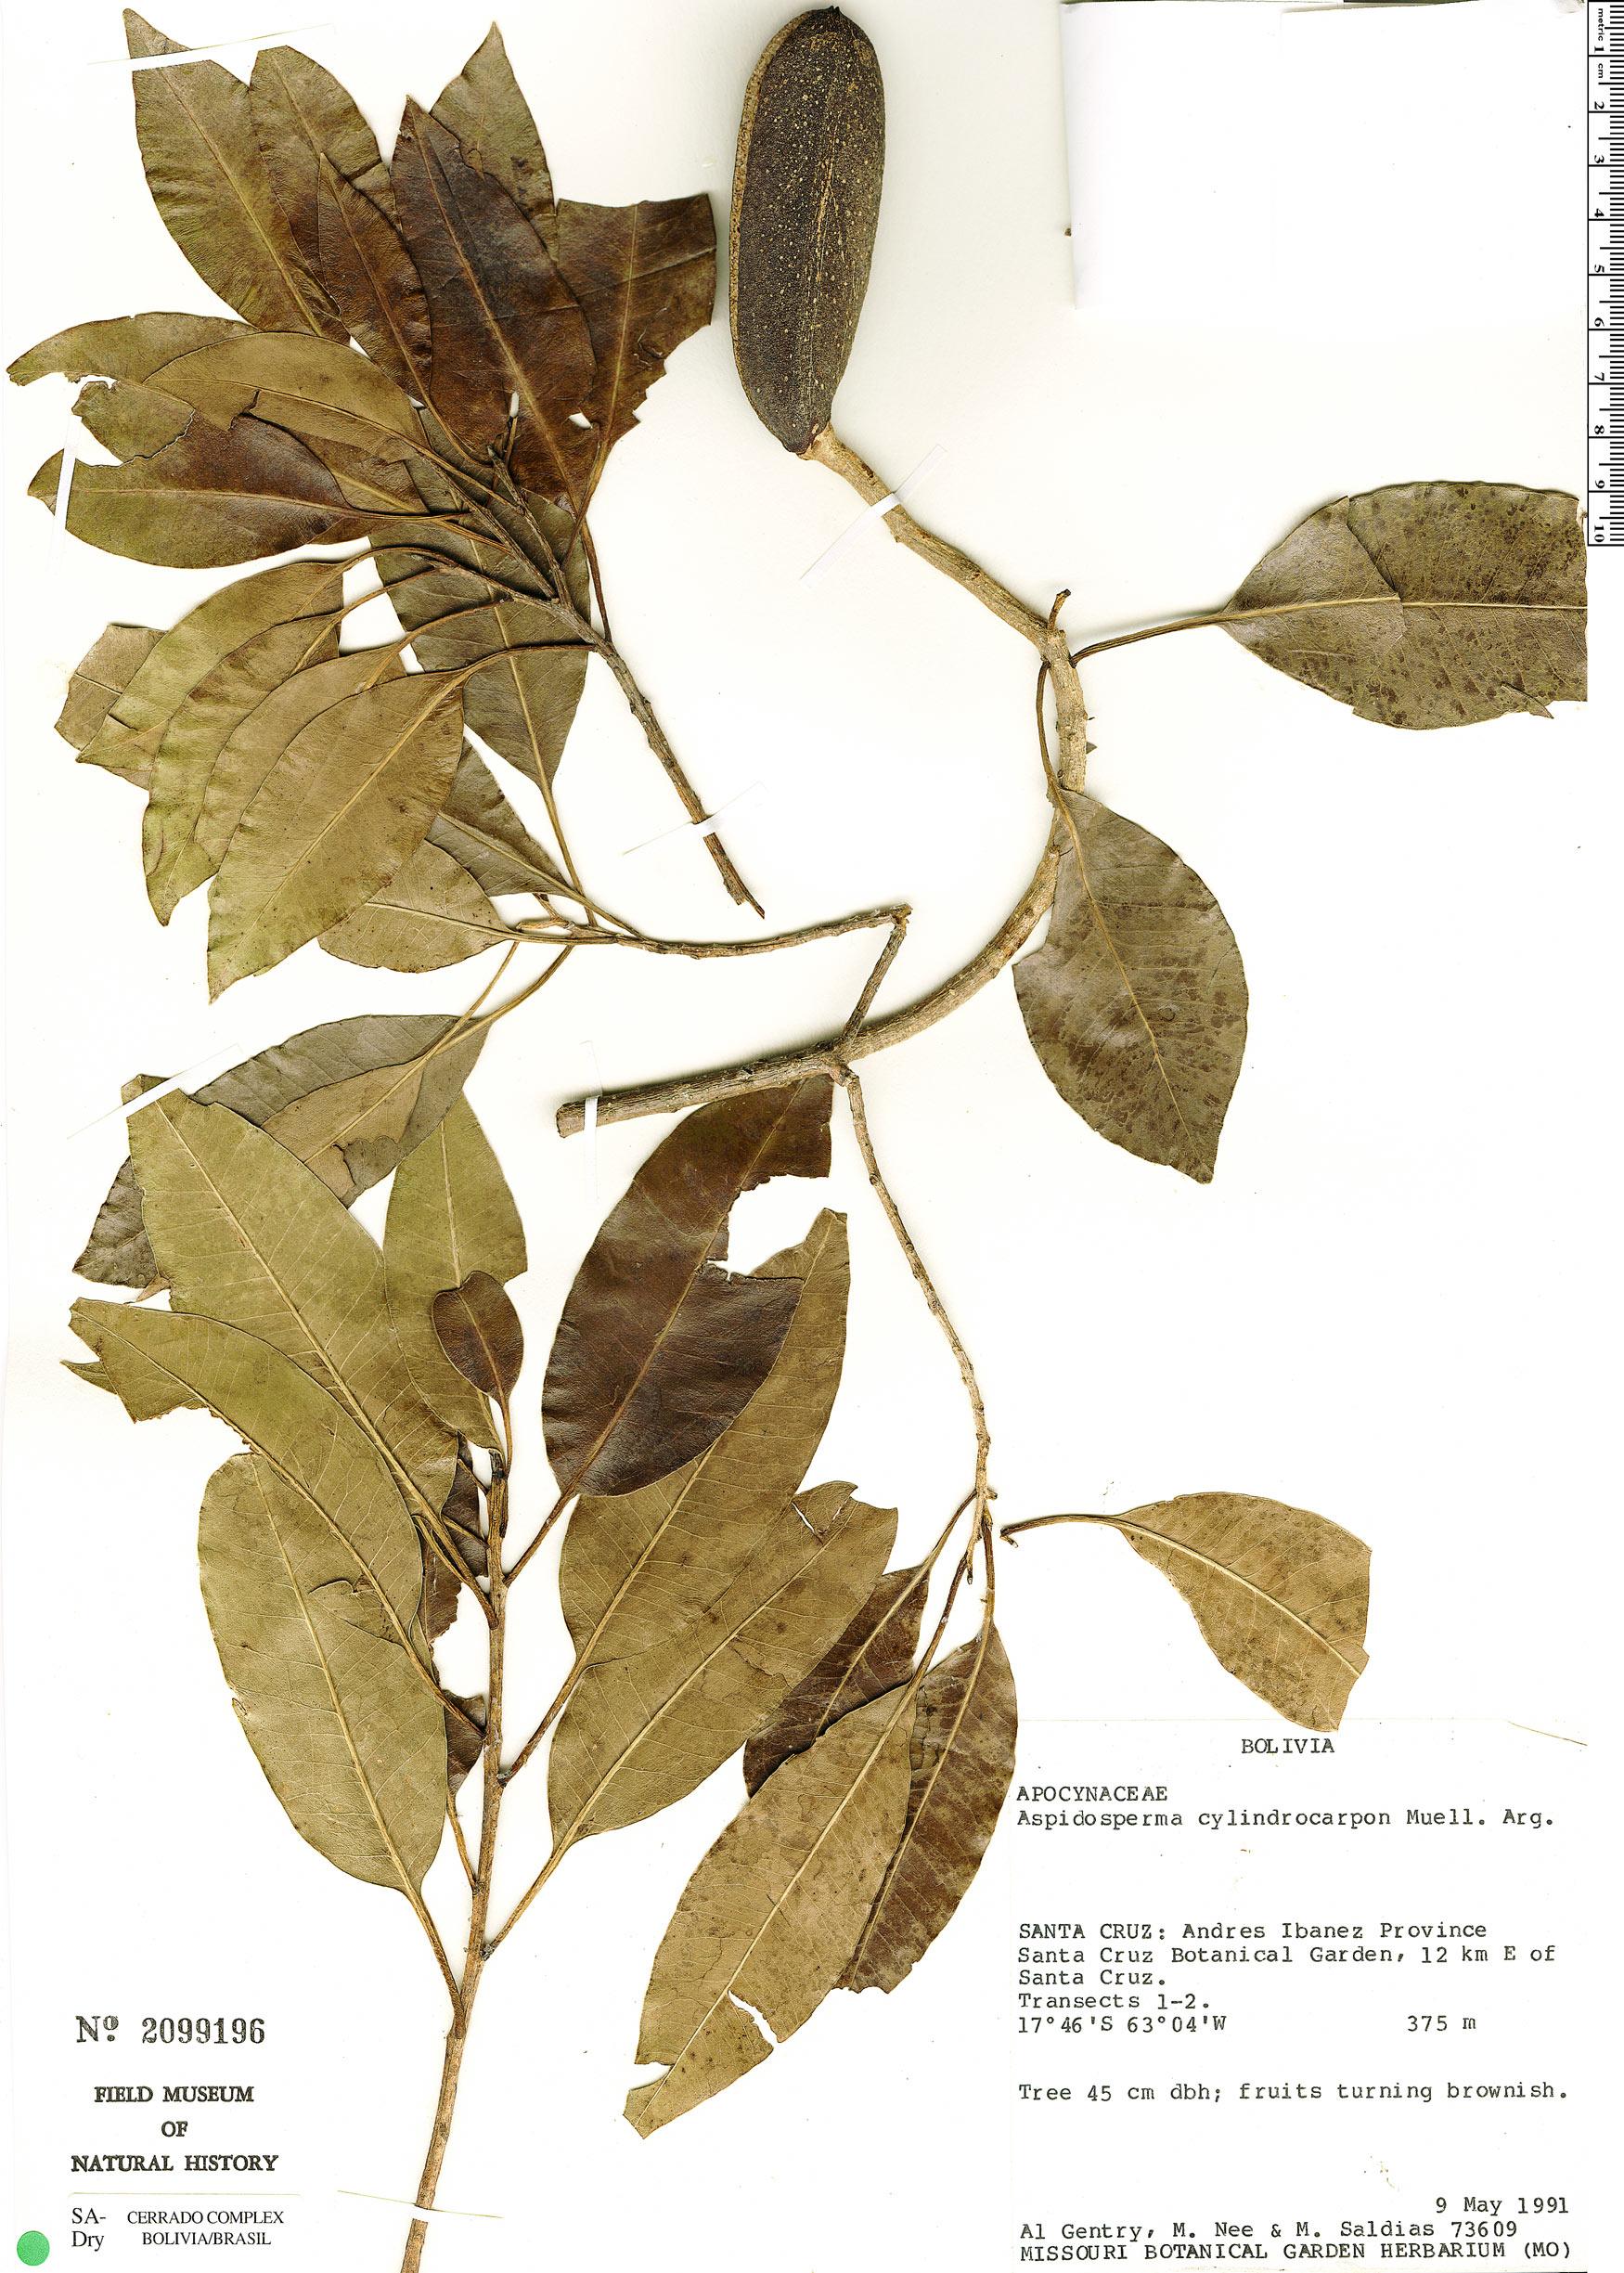 Specimen: Aspidosperma cylindrocarpon